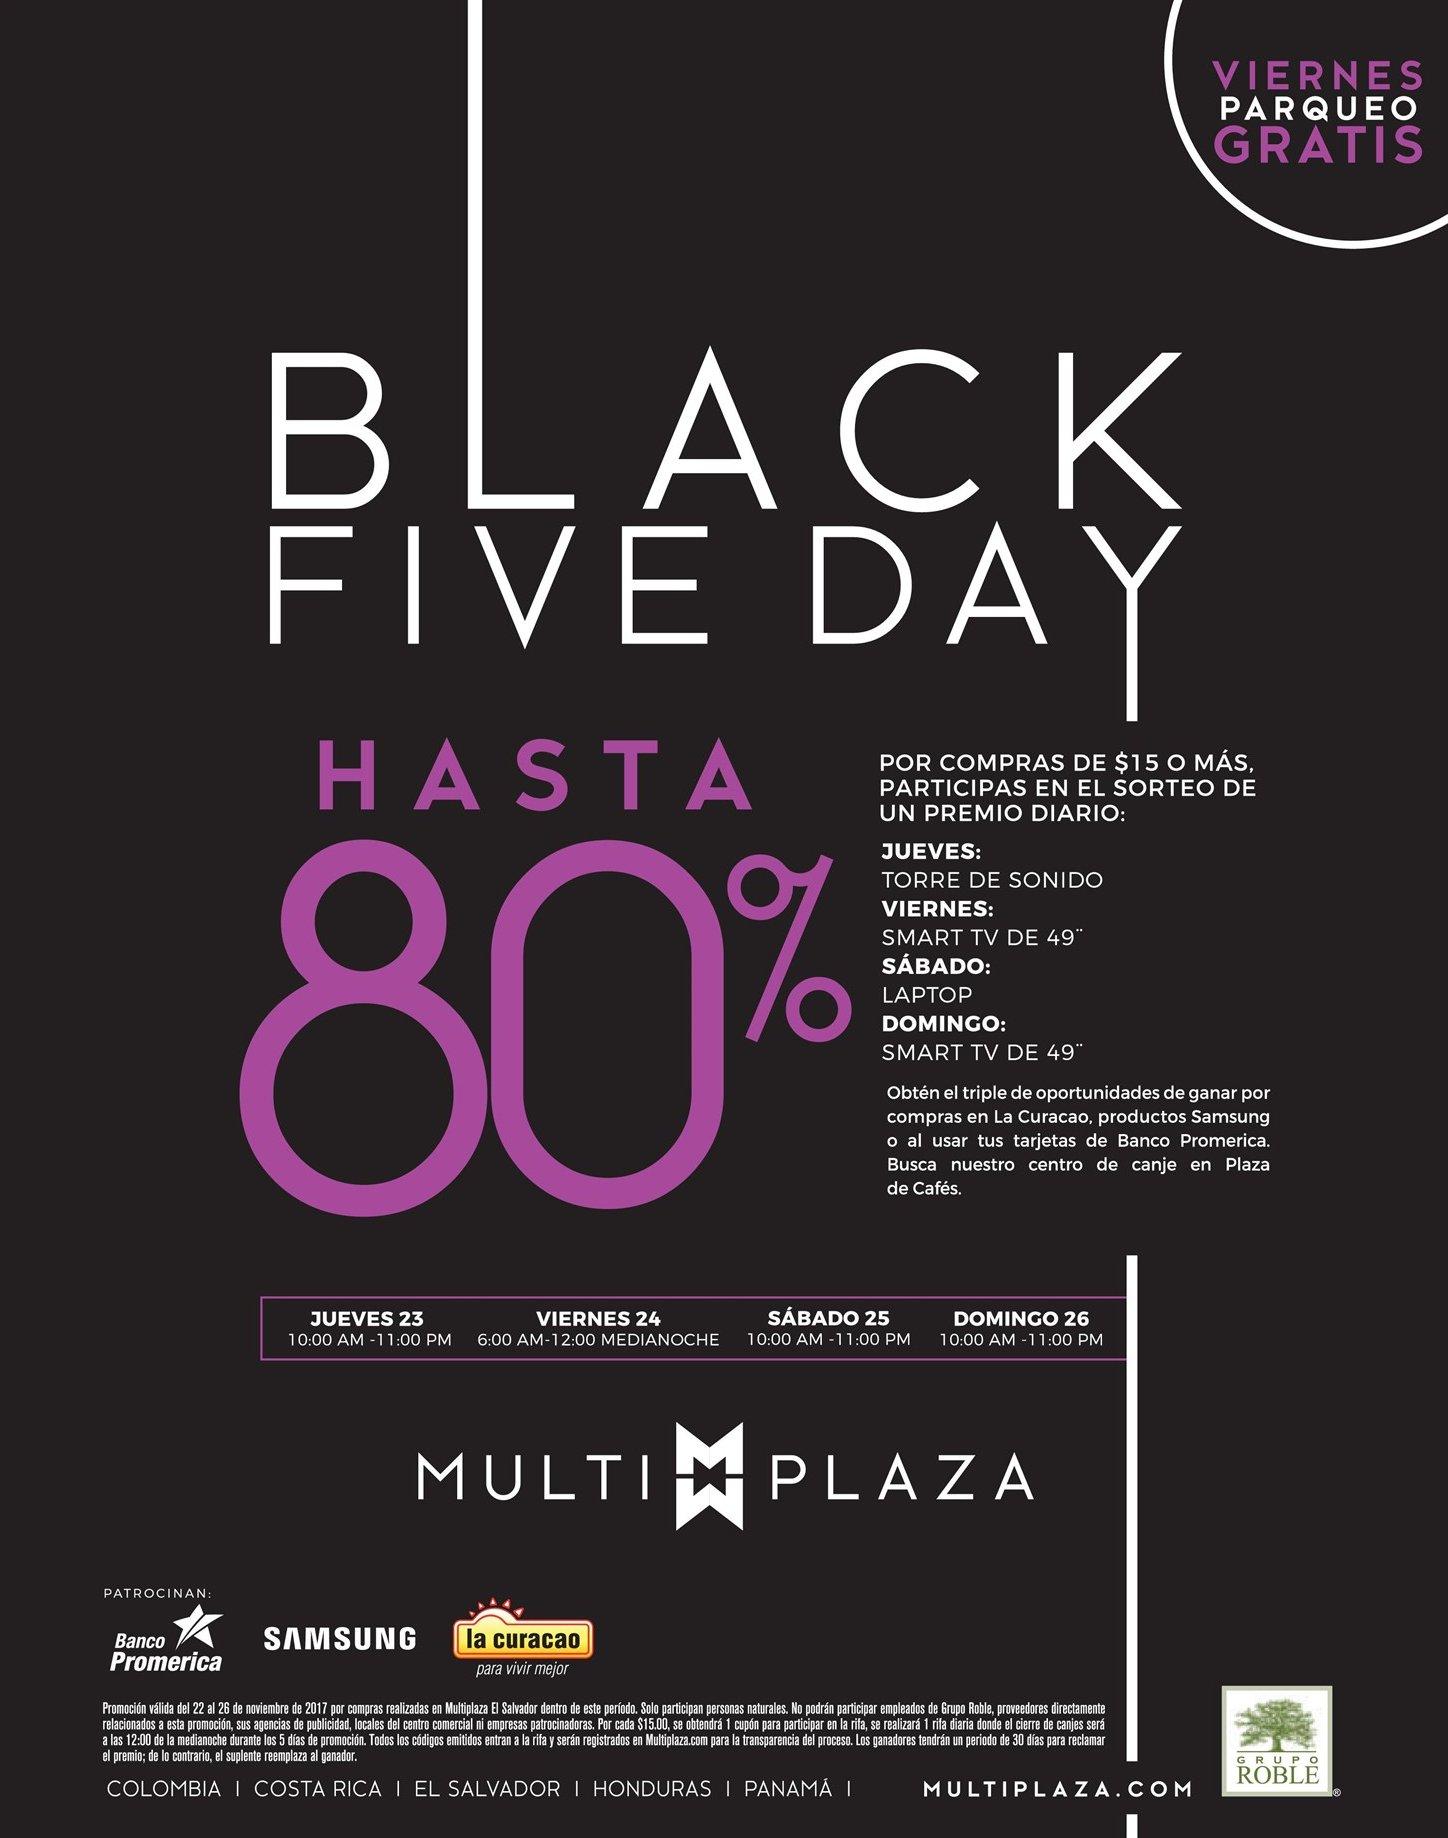 Black FIVE DAY hasta 80 OFF en MULTIPLAZA san salvador